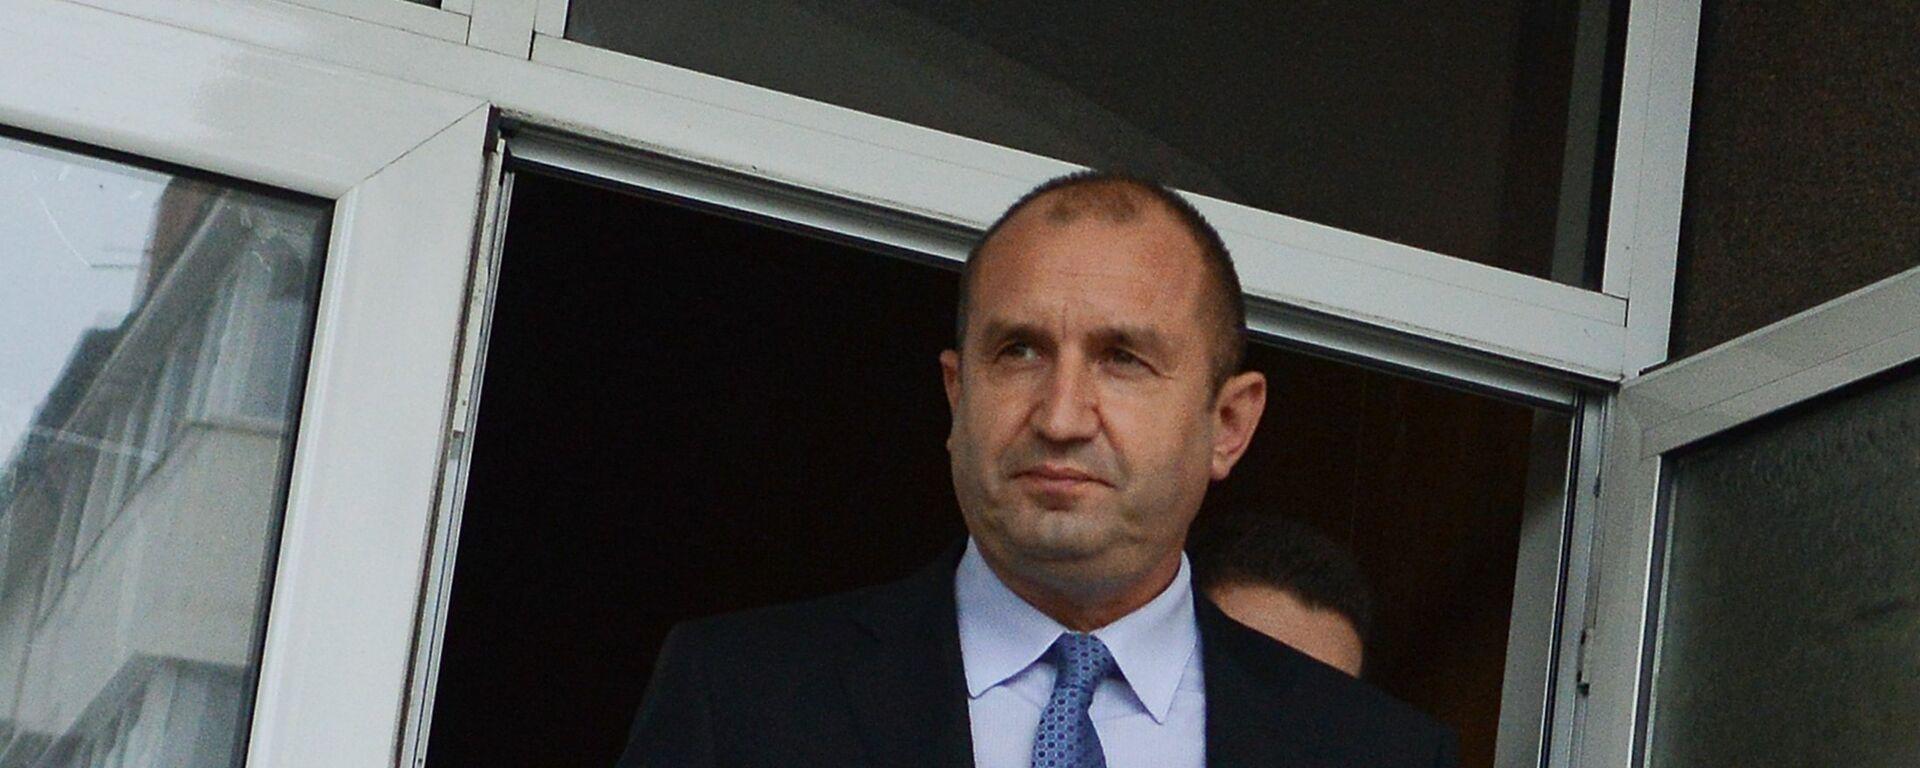 Il Presidente bulgaro Rumen Radev - Sputnik Italia, 1920, 31.05.2021